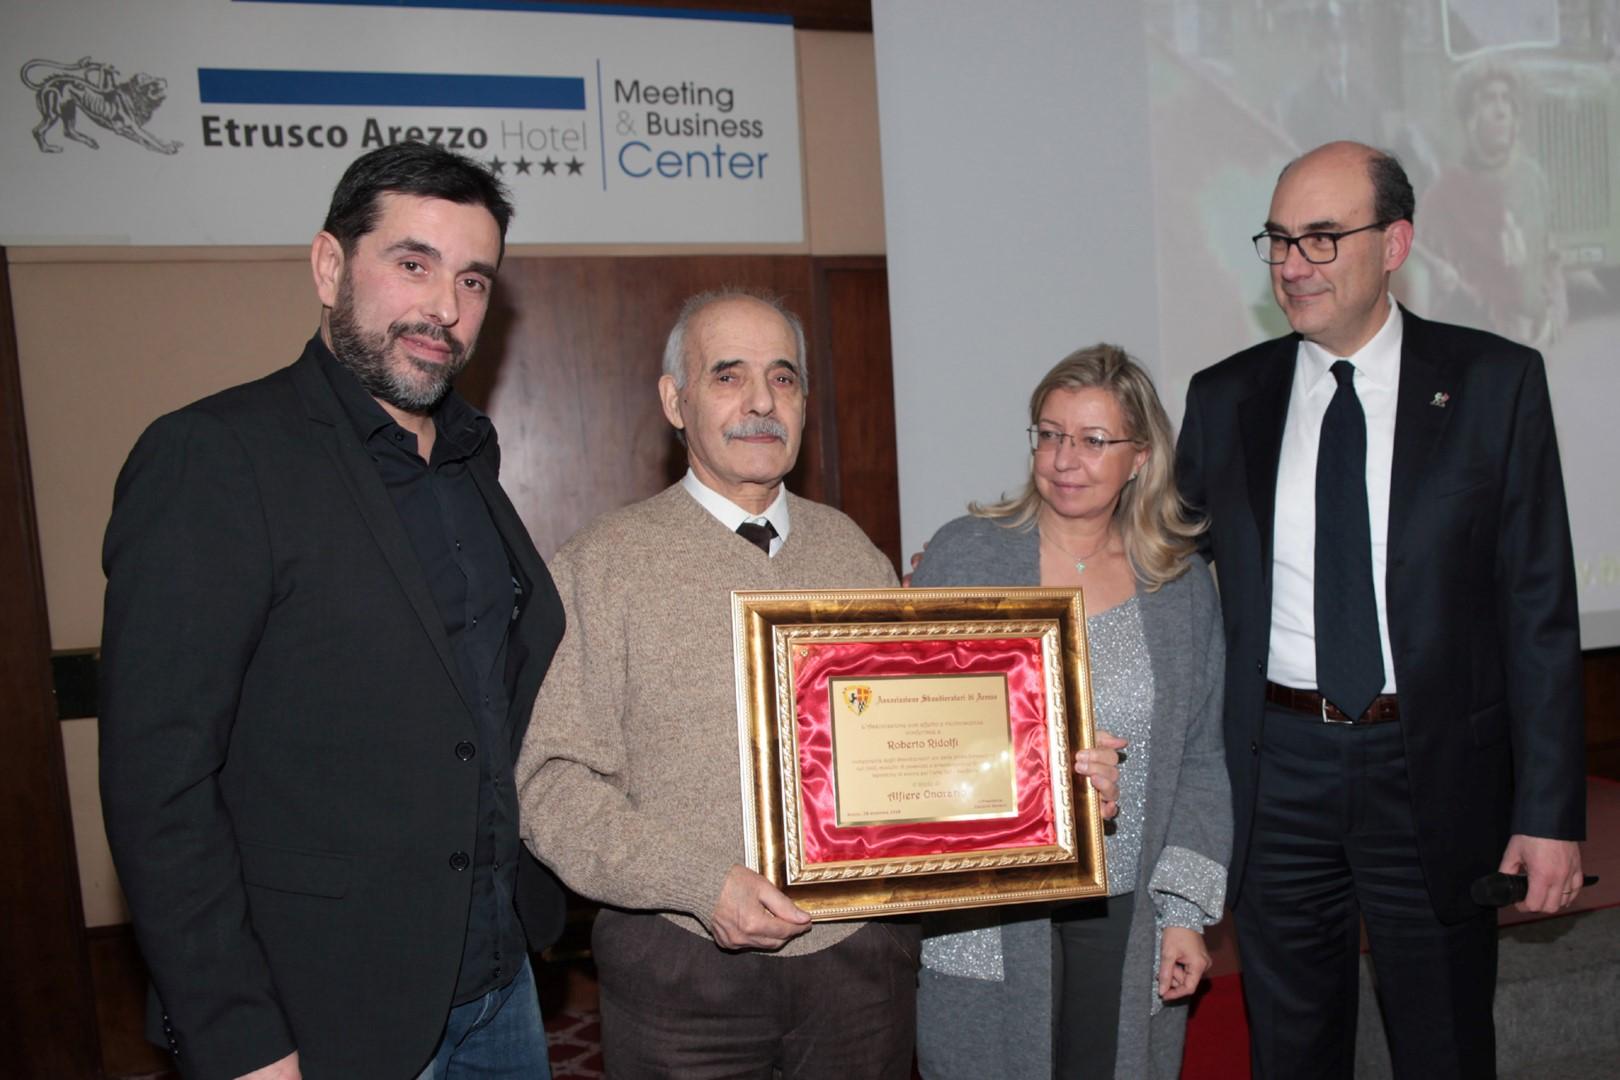 Cena Sbandieratori_Rogialli (2)